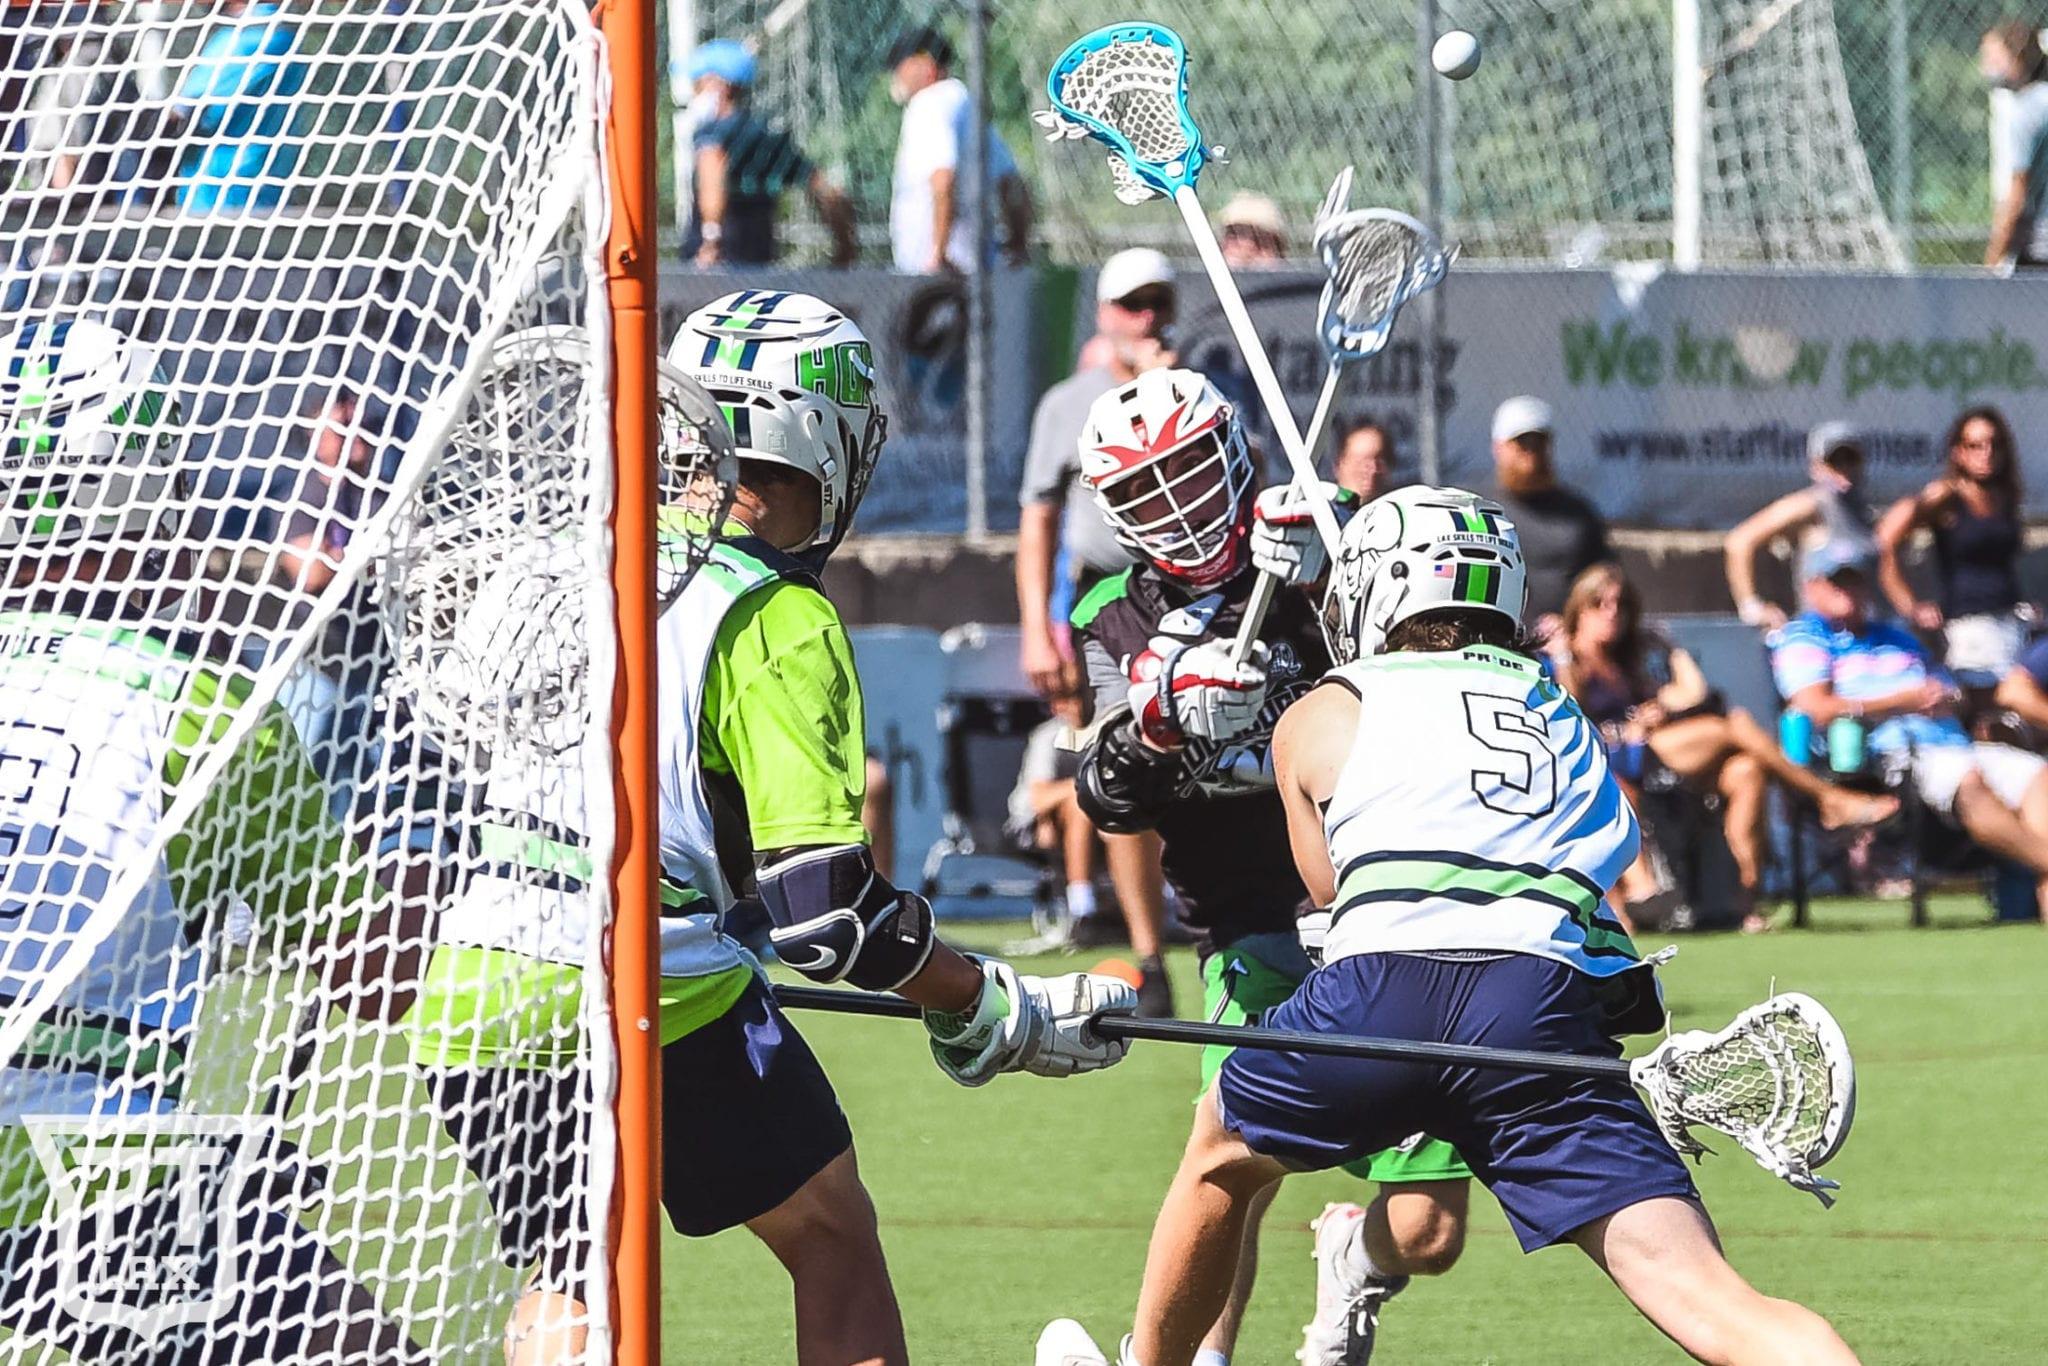 NH 64 PrimeTime Lacrosse event New Hampshire